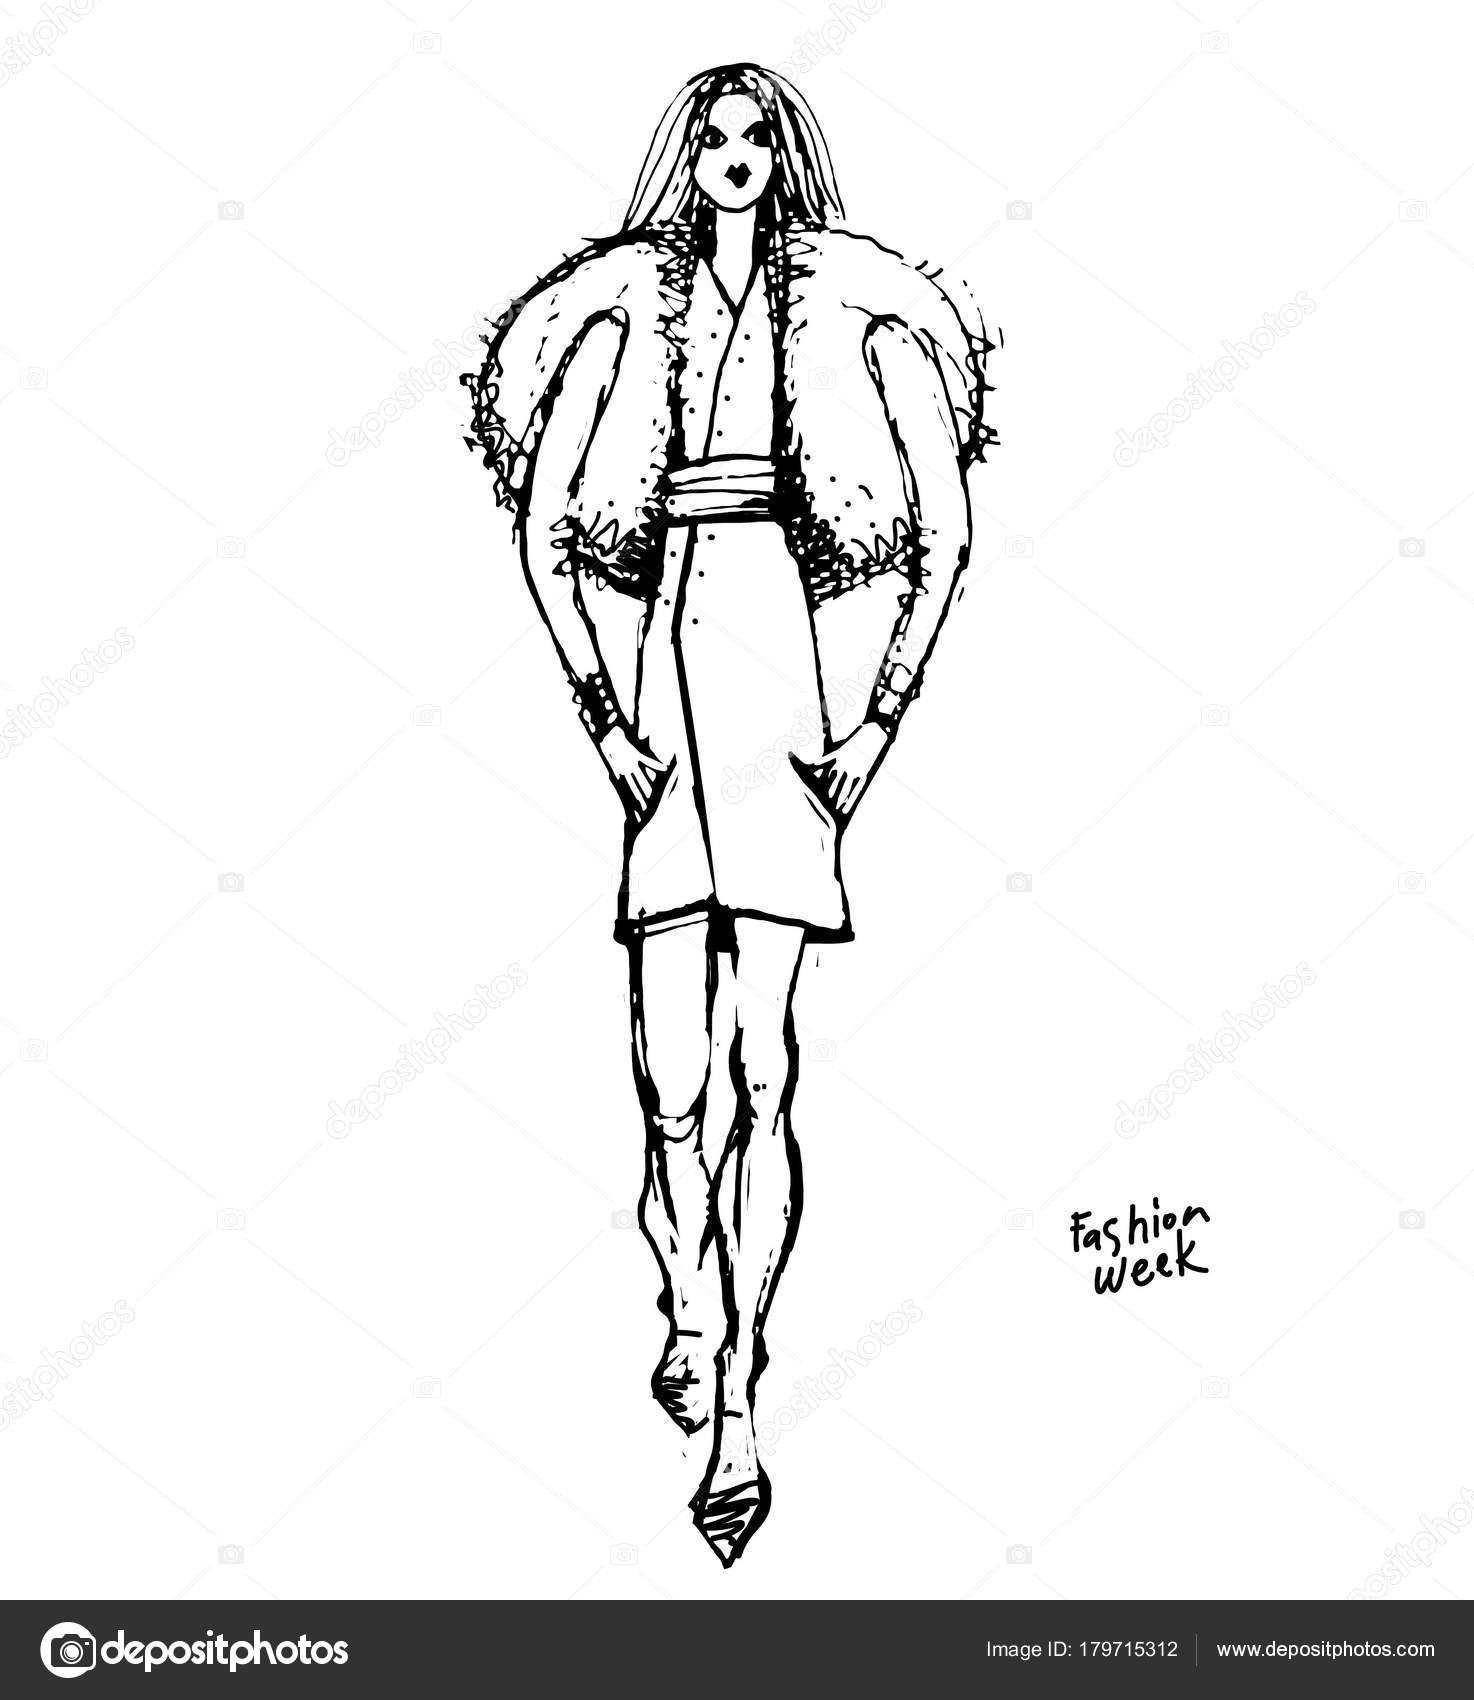 Fashion Sketchbook Fashion Design Development Black White Sketch Clothes Sketch Stock Vector C Iralu1 179715312